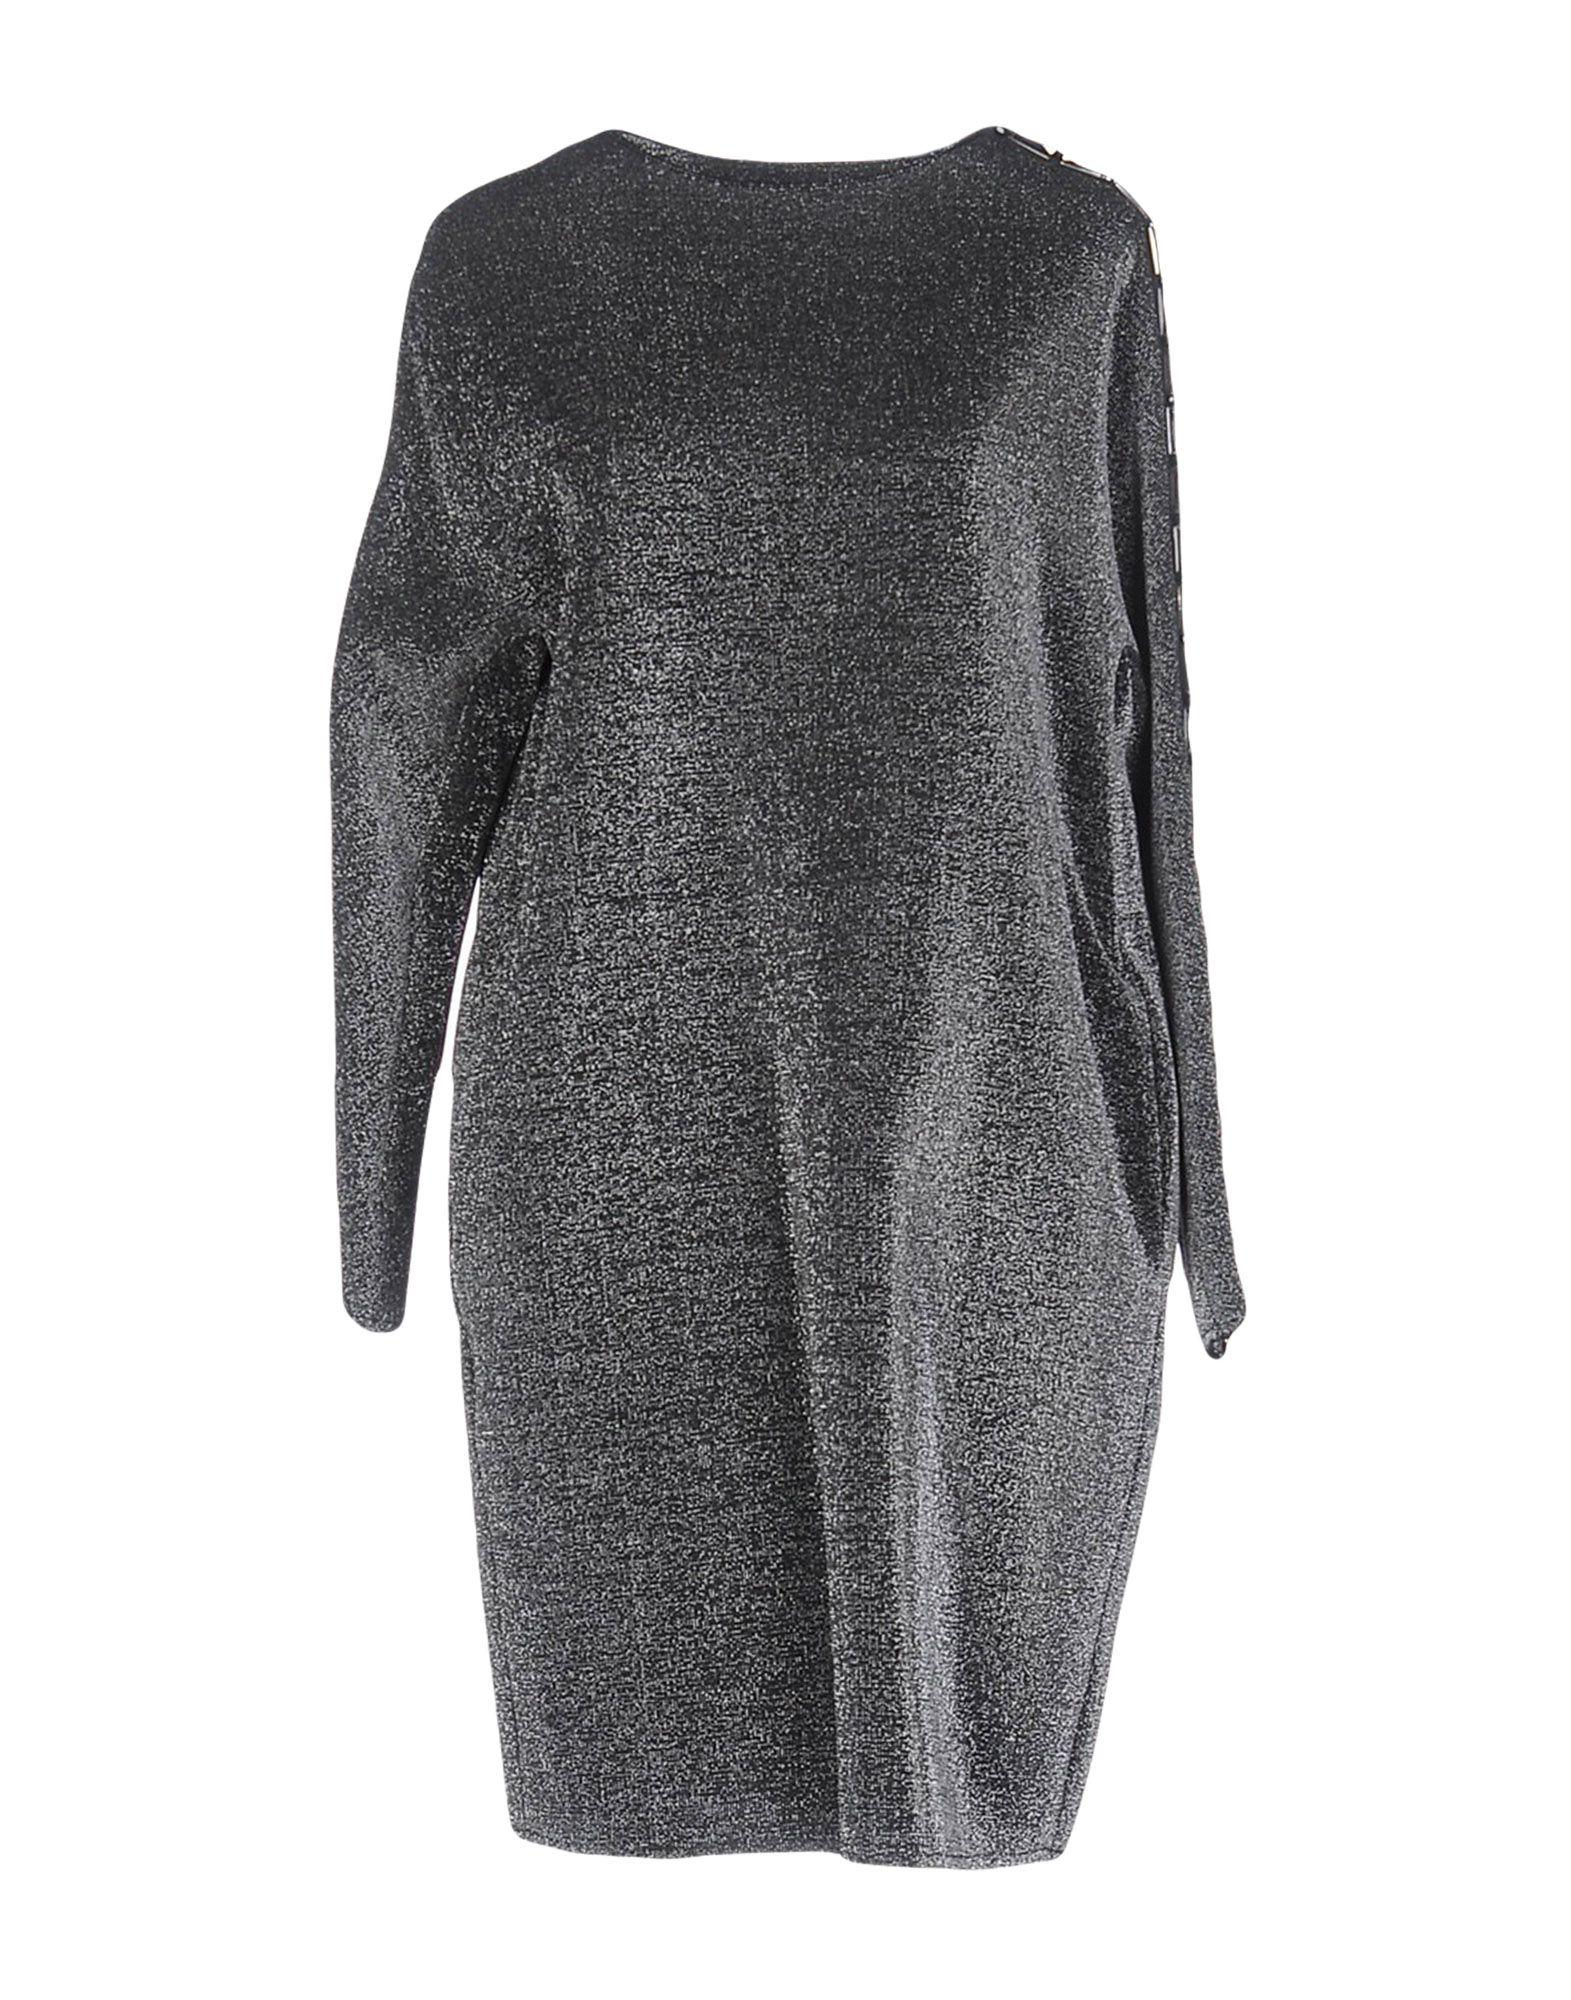 OBLÒ Damen Kurzes Kleid Farbe Blei Größe 4